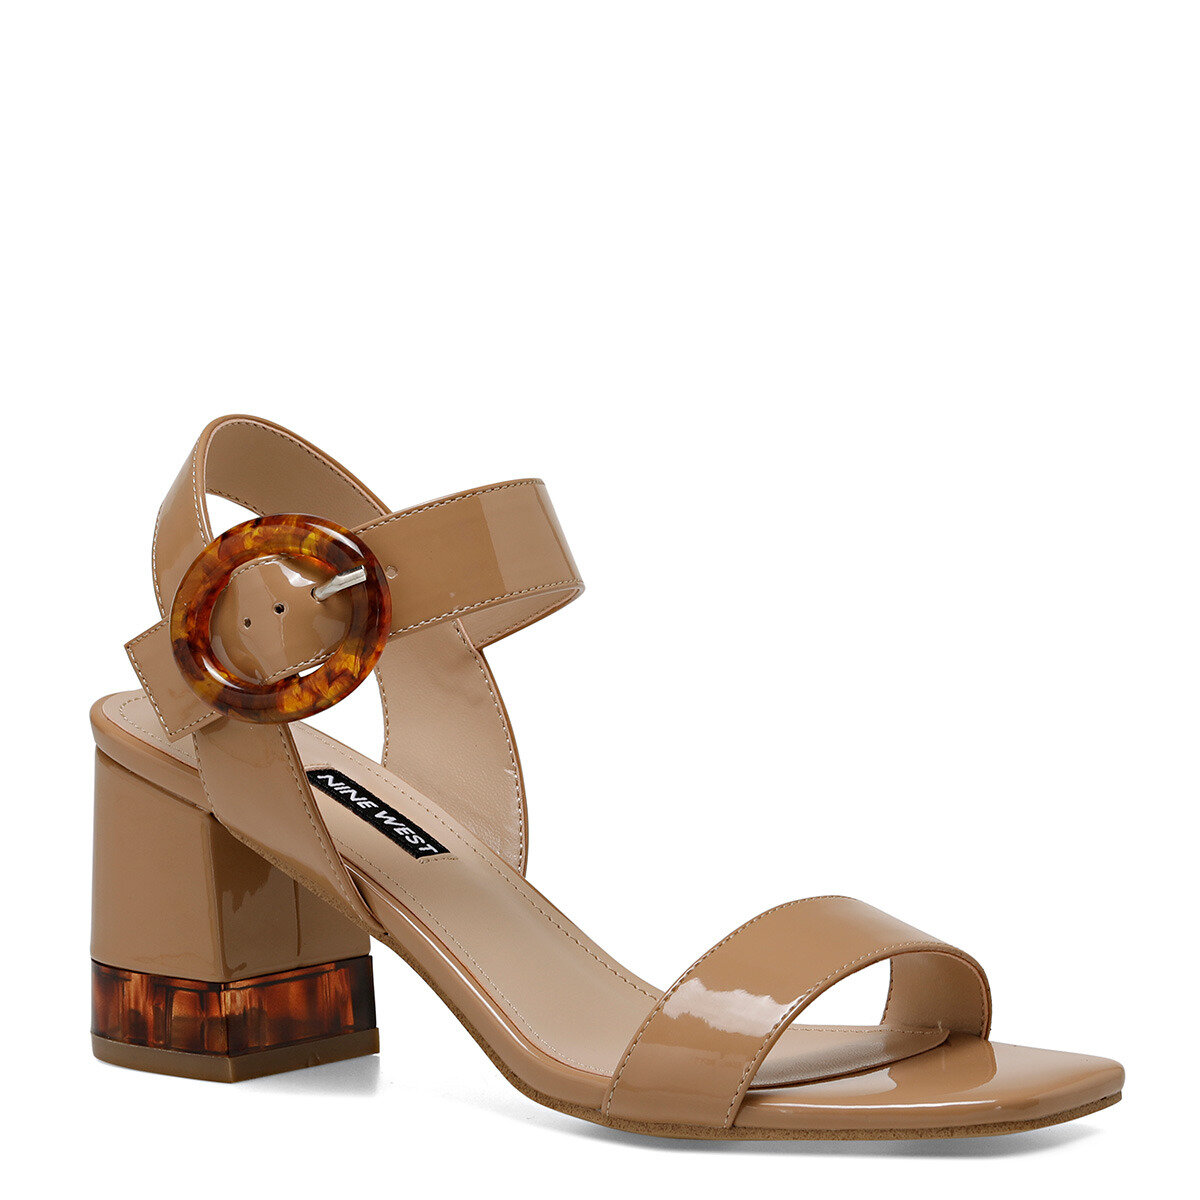 LENA Naturel Kadın Topuklu Sandalet